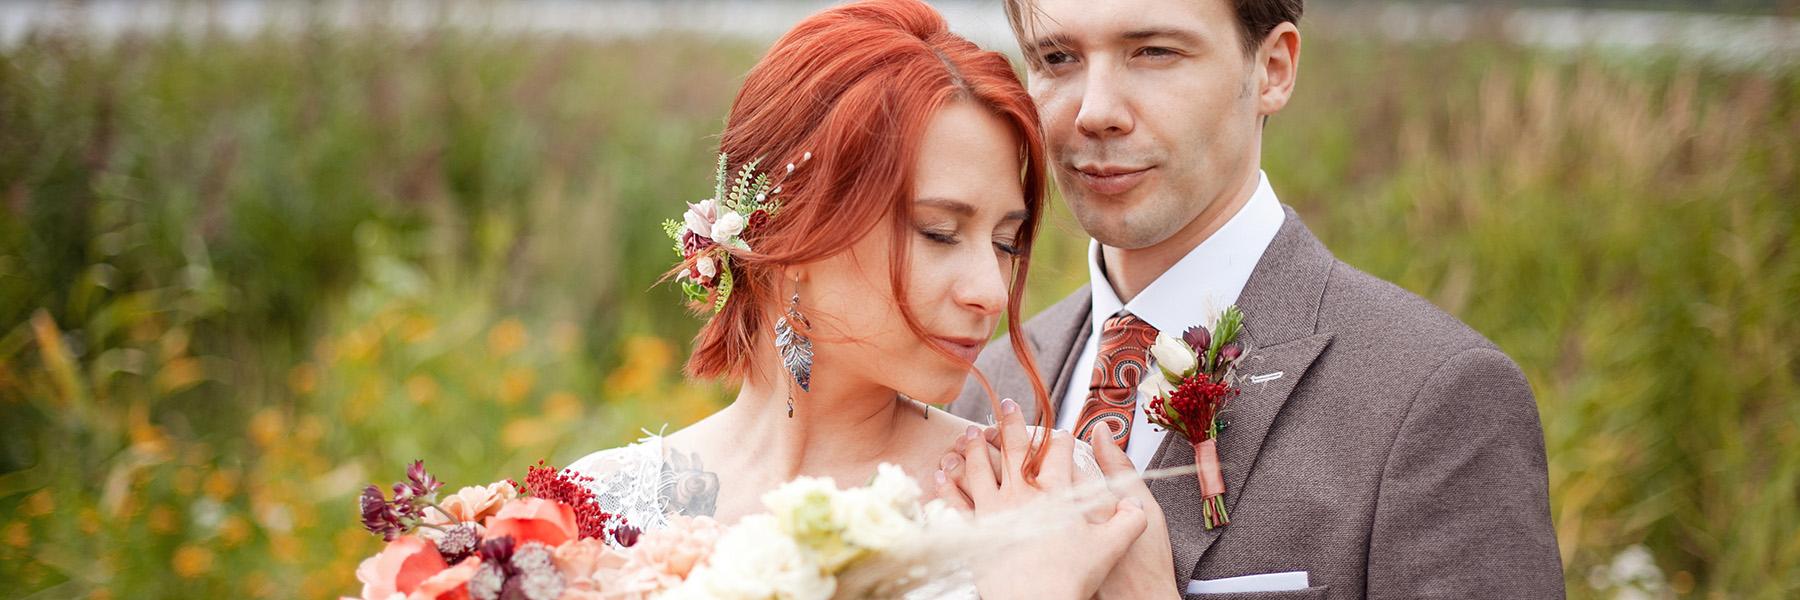 свадьба санкт петербург